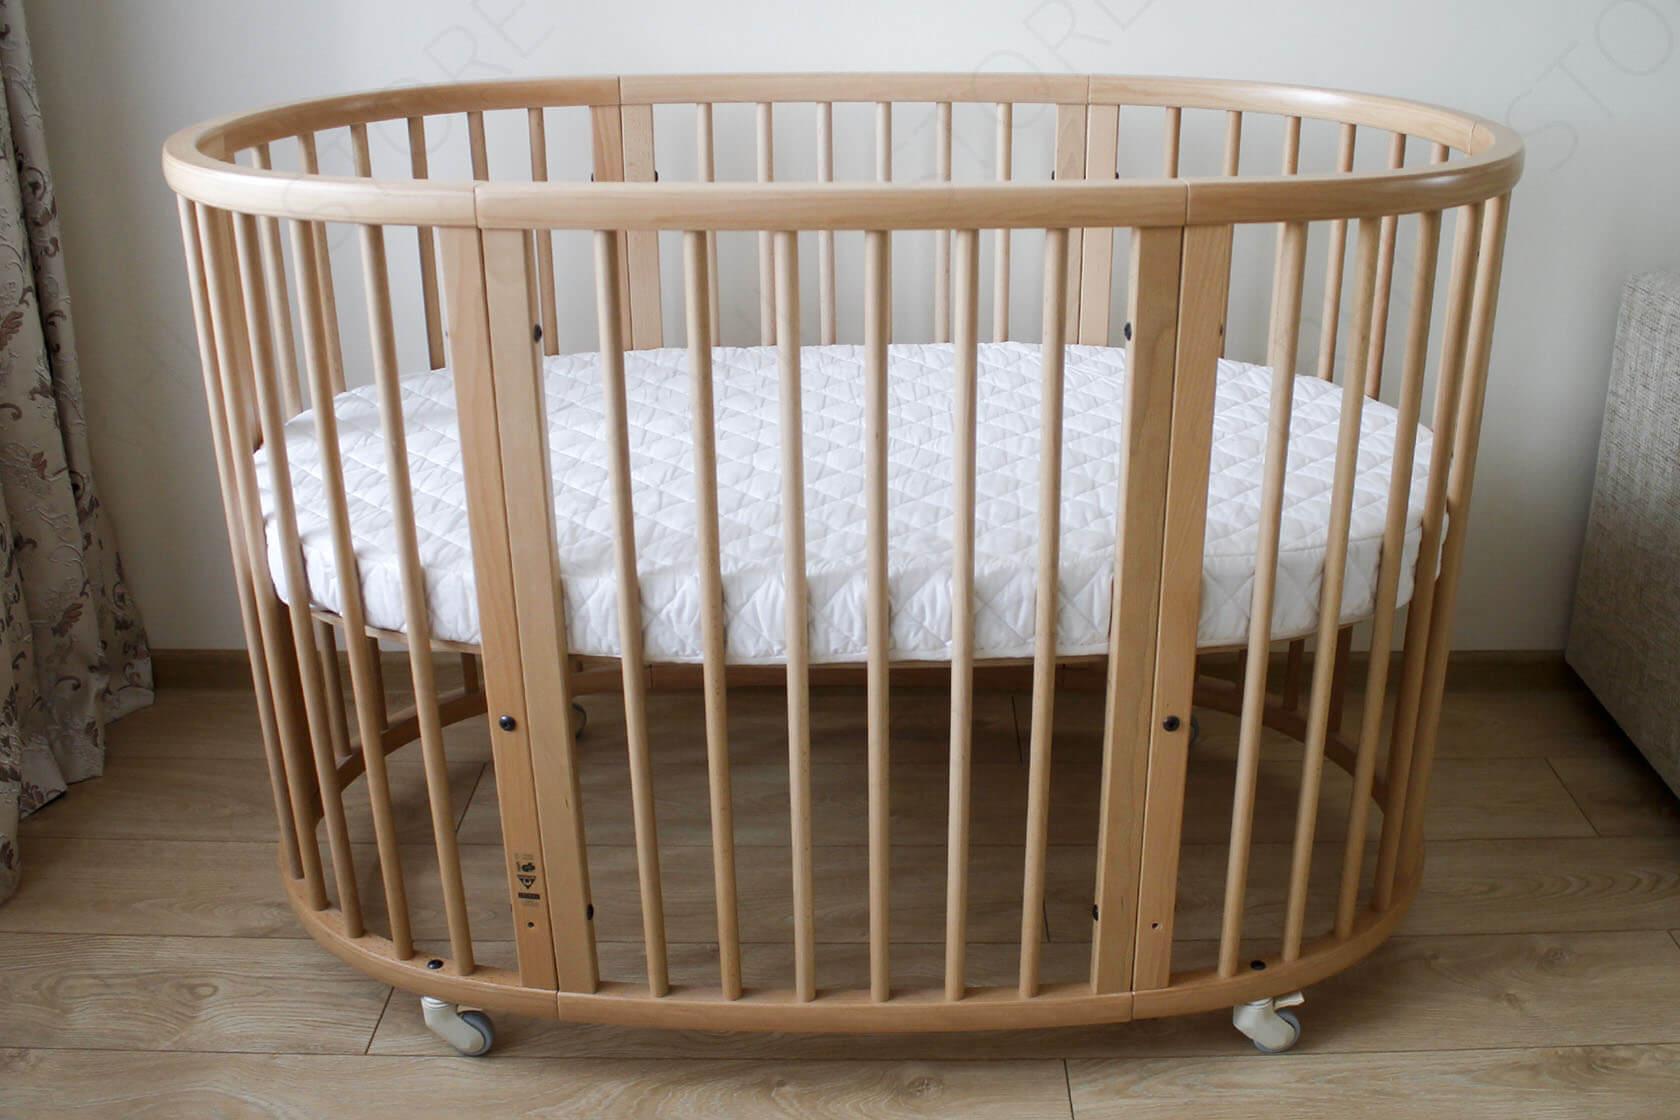 Matras Stokke Sleepi : Овальная кроватка трансформер аналог stokke sleepi цена